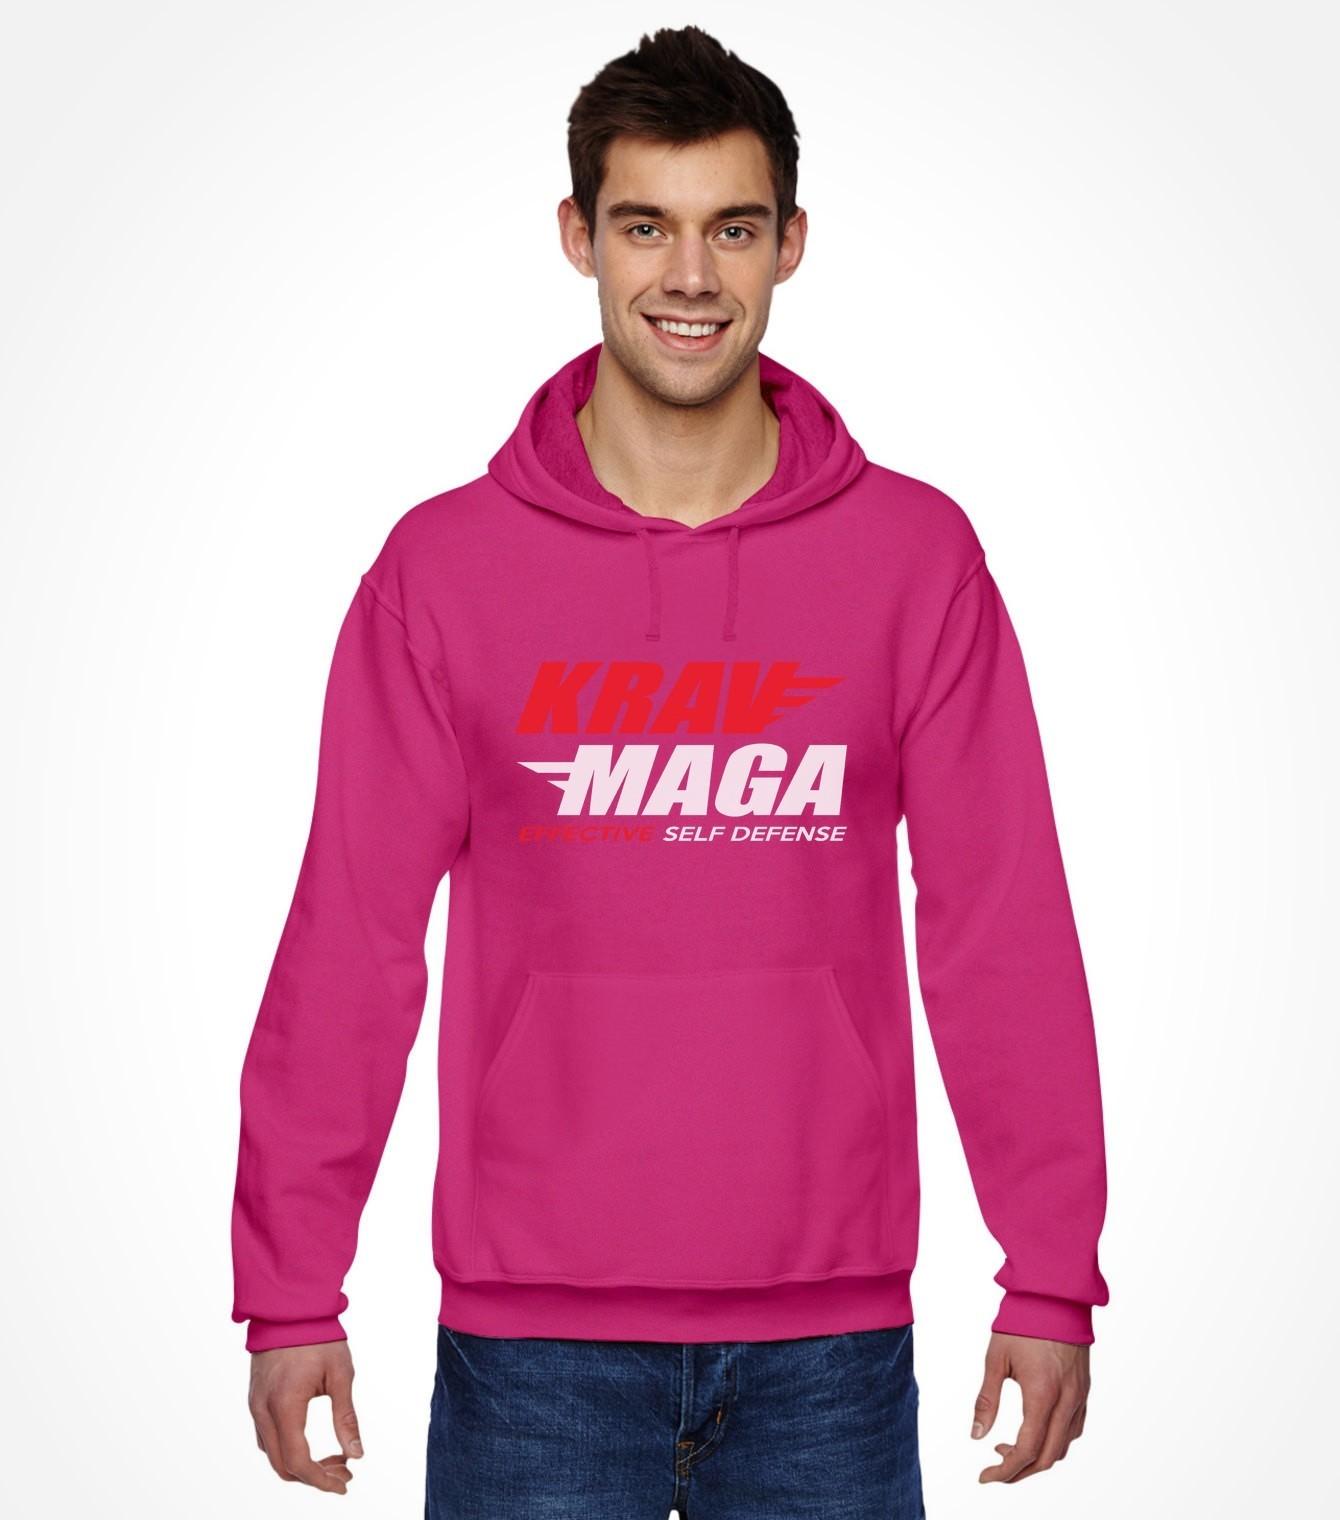 Krav Maga Effective Self Defense Shirt - Israeli-T